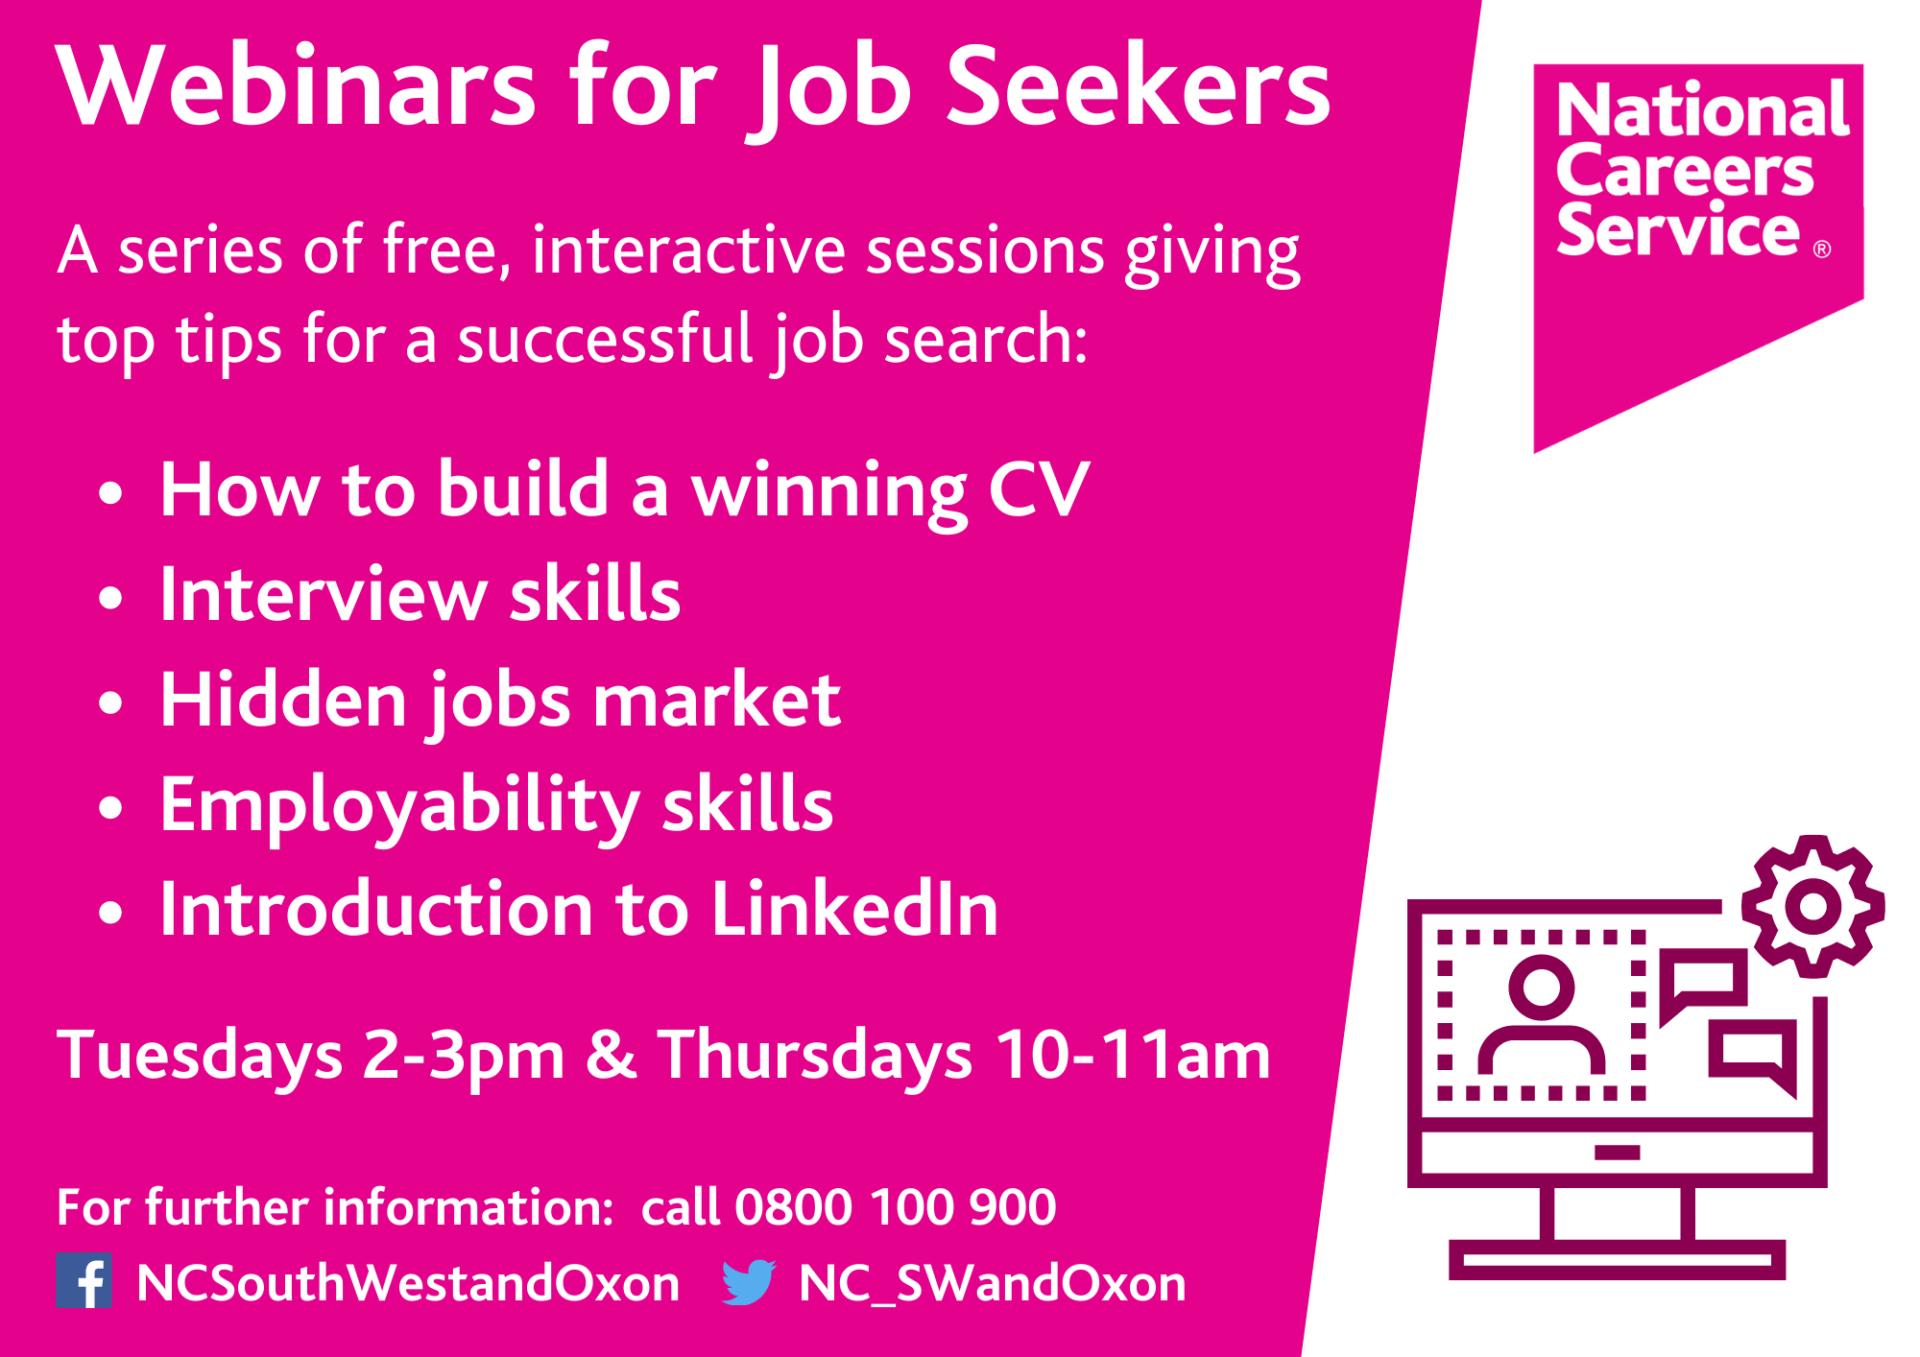 National Careers Service webinars for job seekers banner